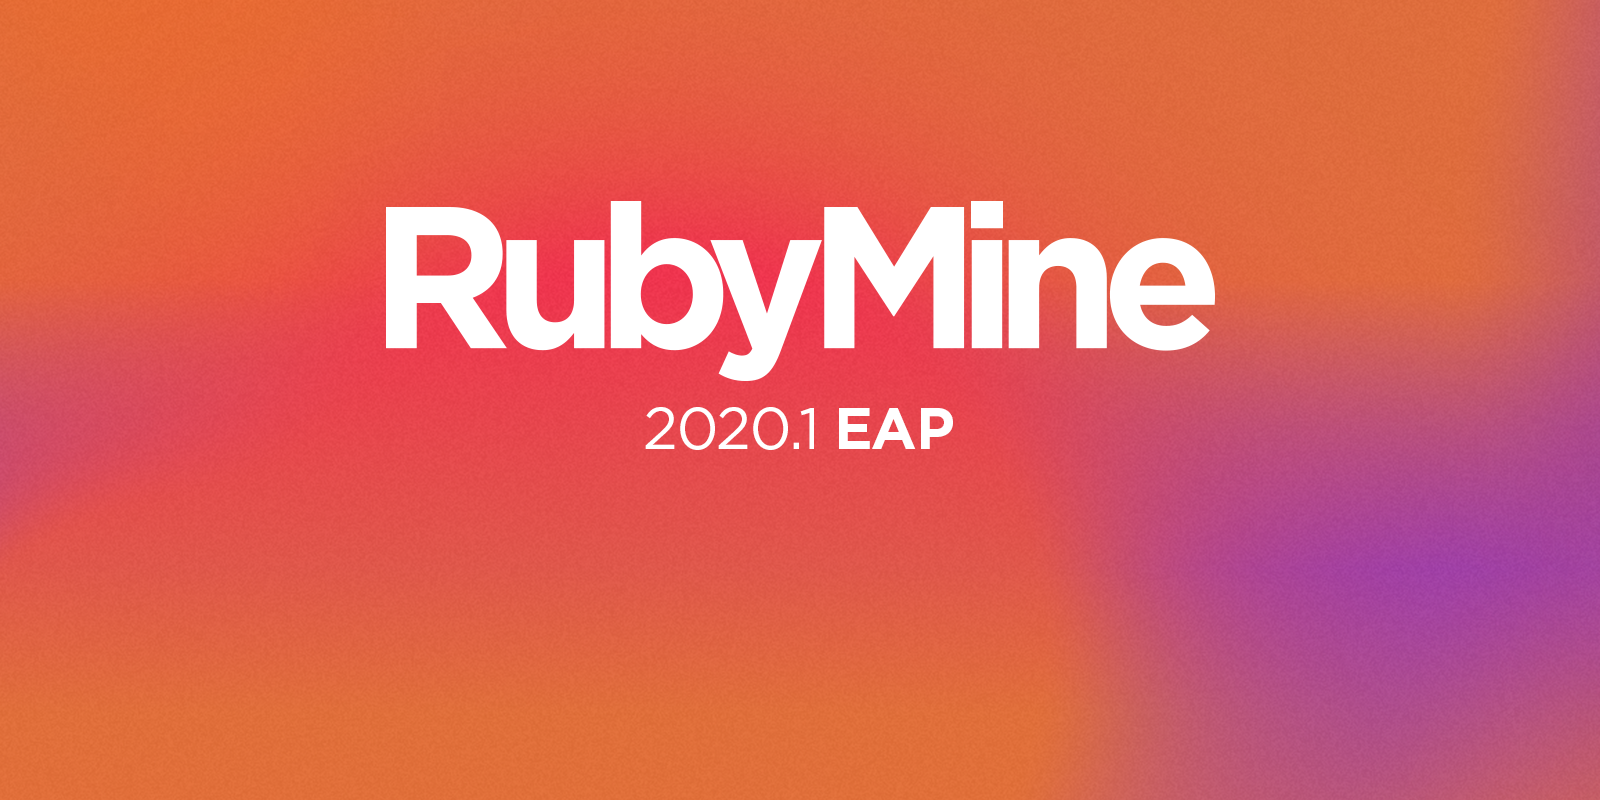 RubyMine 2020.1 EAP